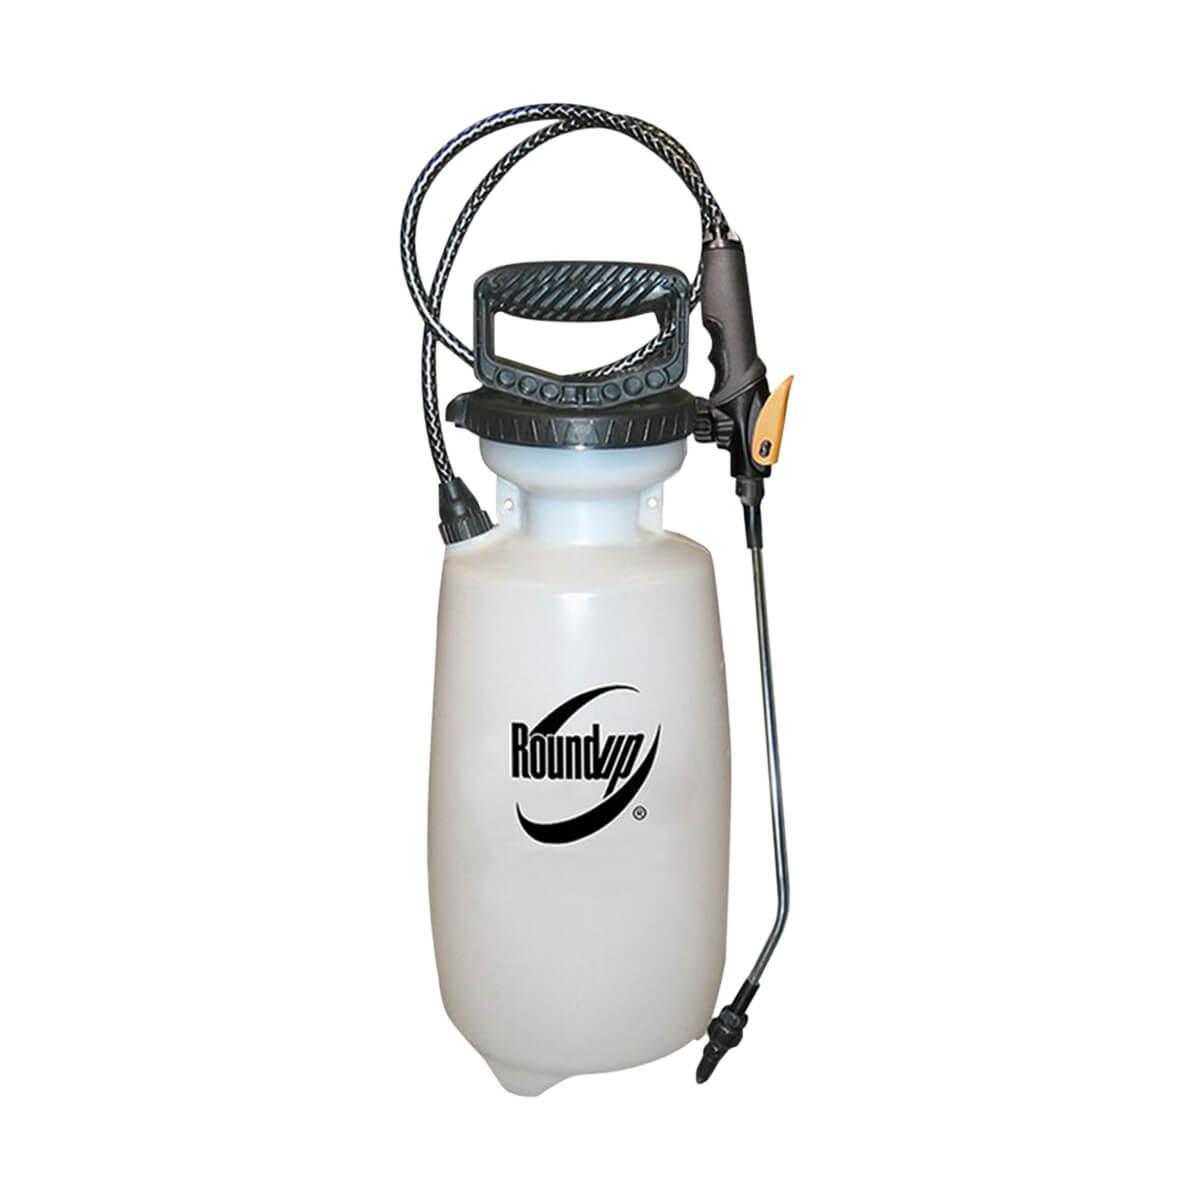 Roundup® Sprayer  - 2 Gallon